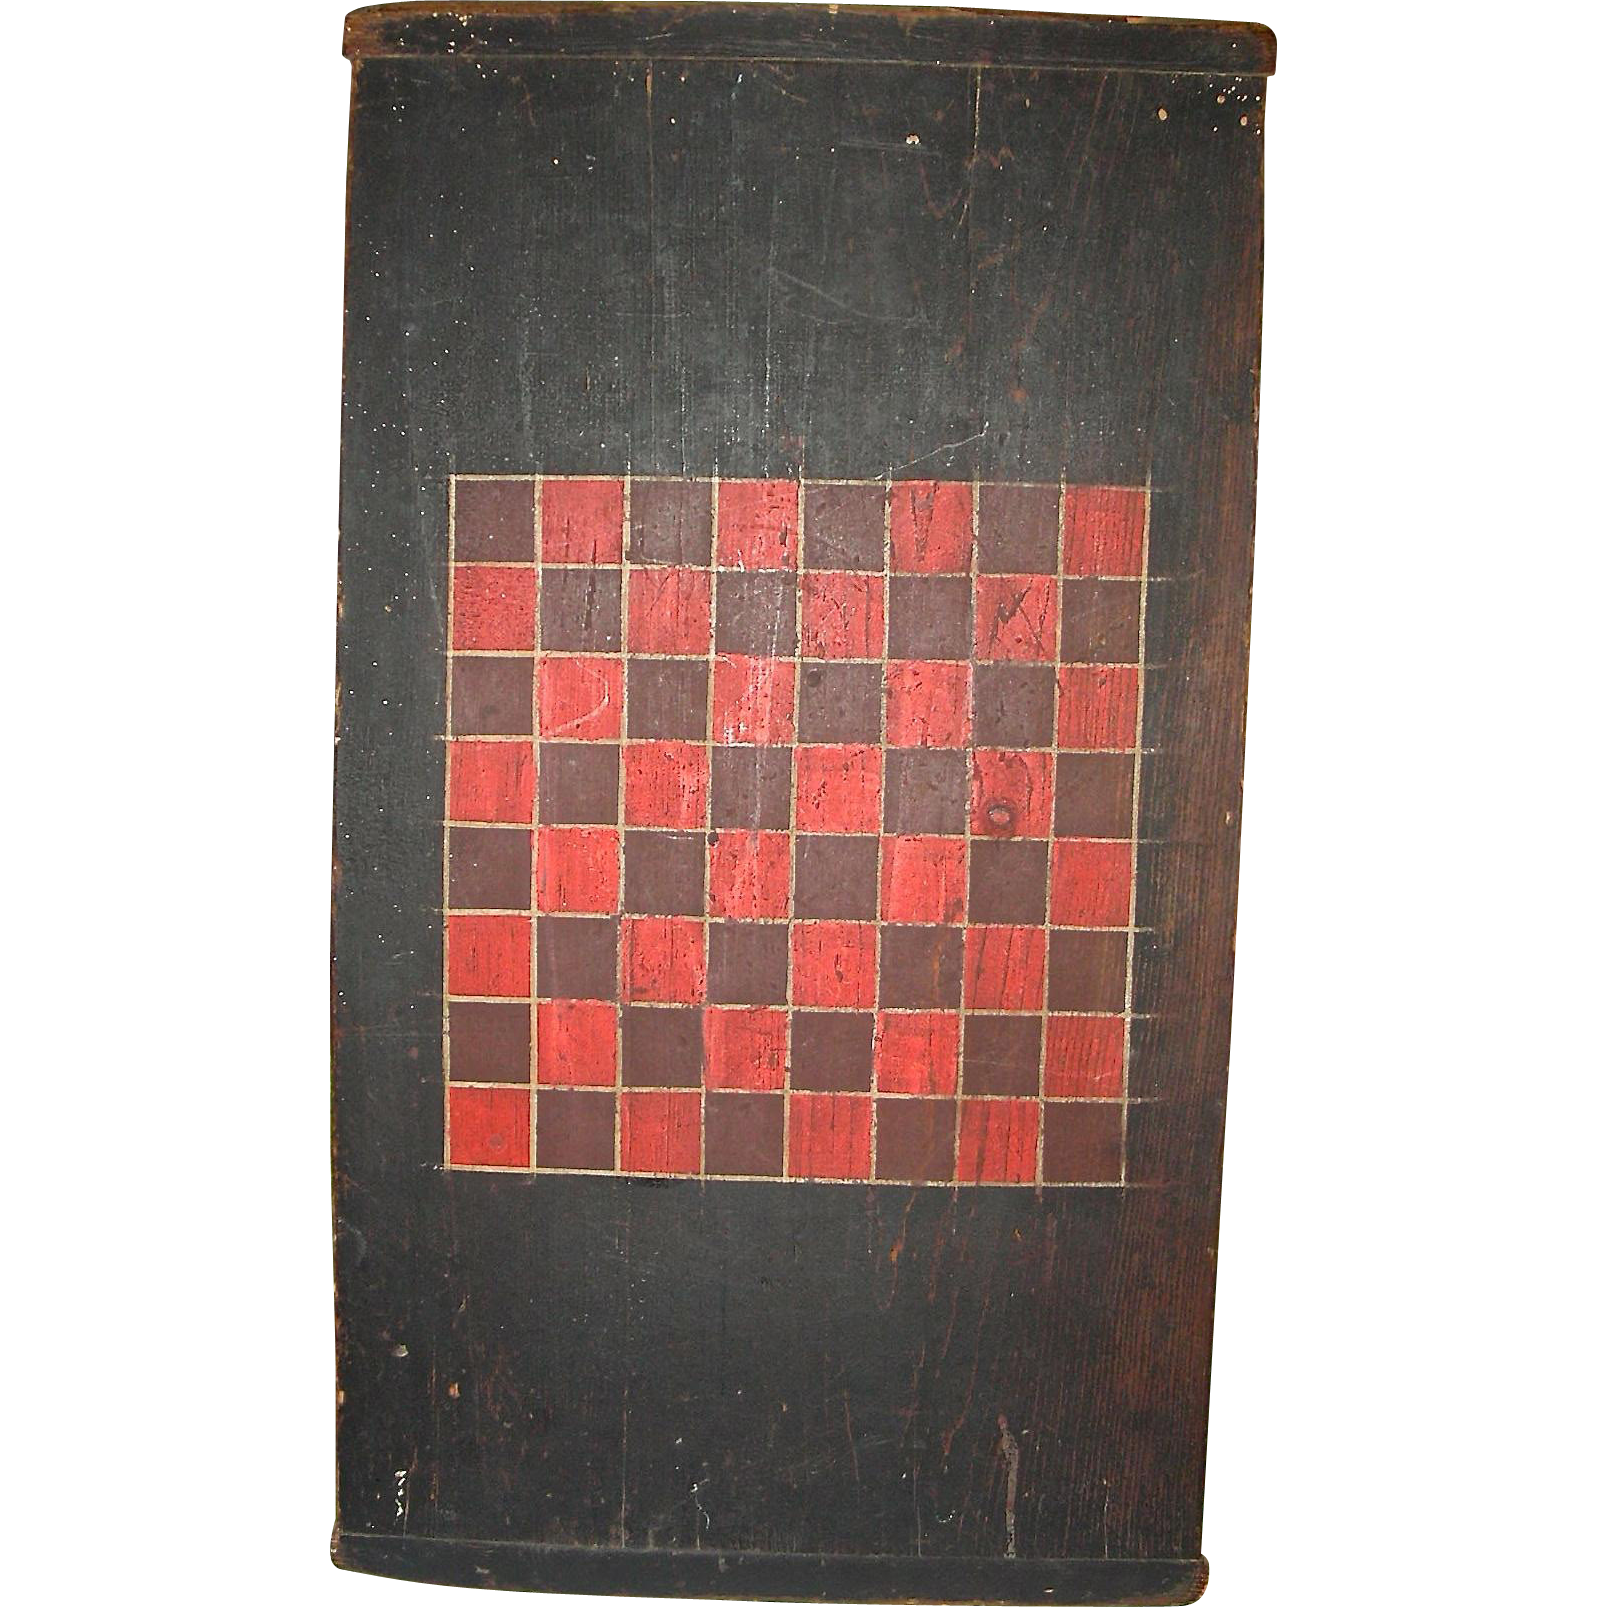 3-Color American Game or Checkerboard w/ Breadboard Ends w/ Original Surface